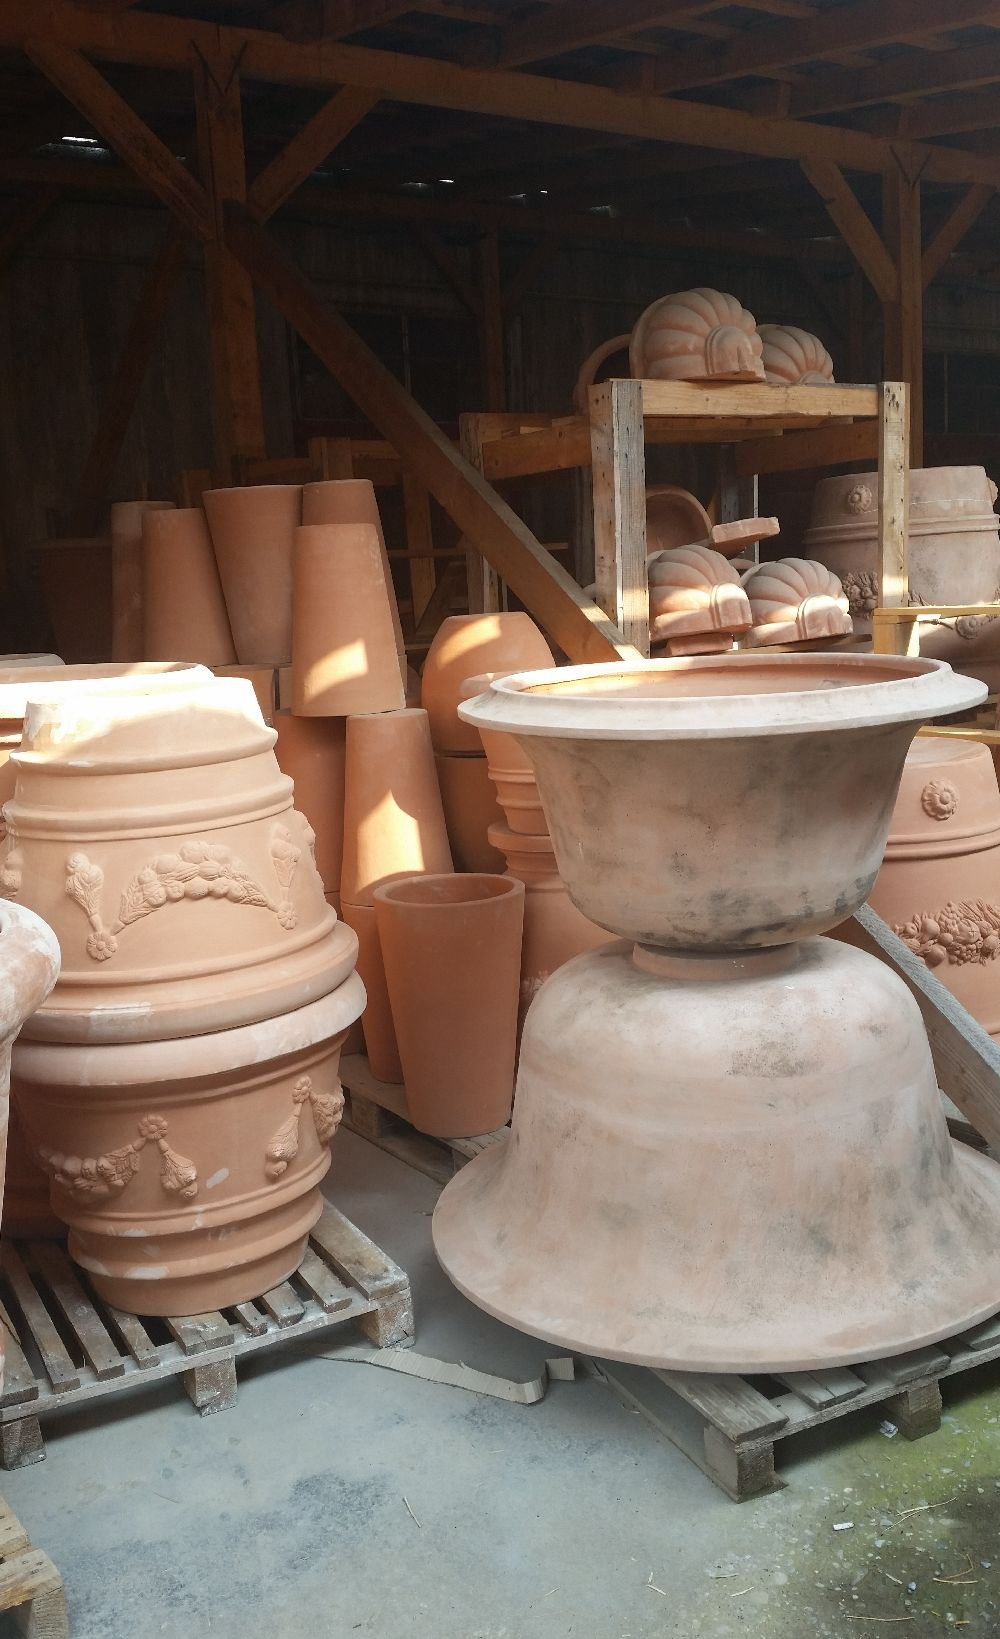 adelaparvu.com despre vase de gradina, ghivece si ornamente din teracota, lut, Terecote Sighisoara Romania (14)